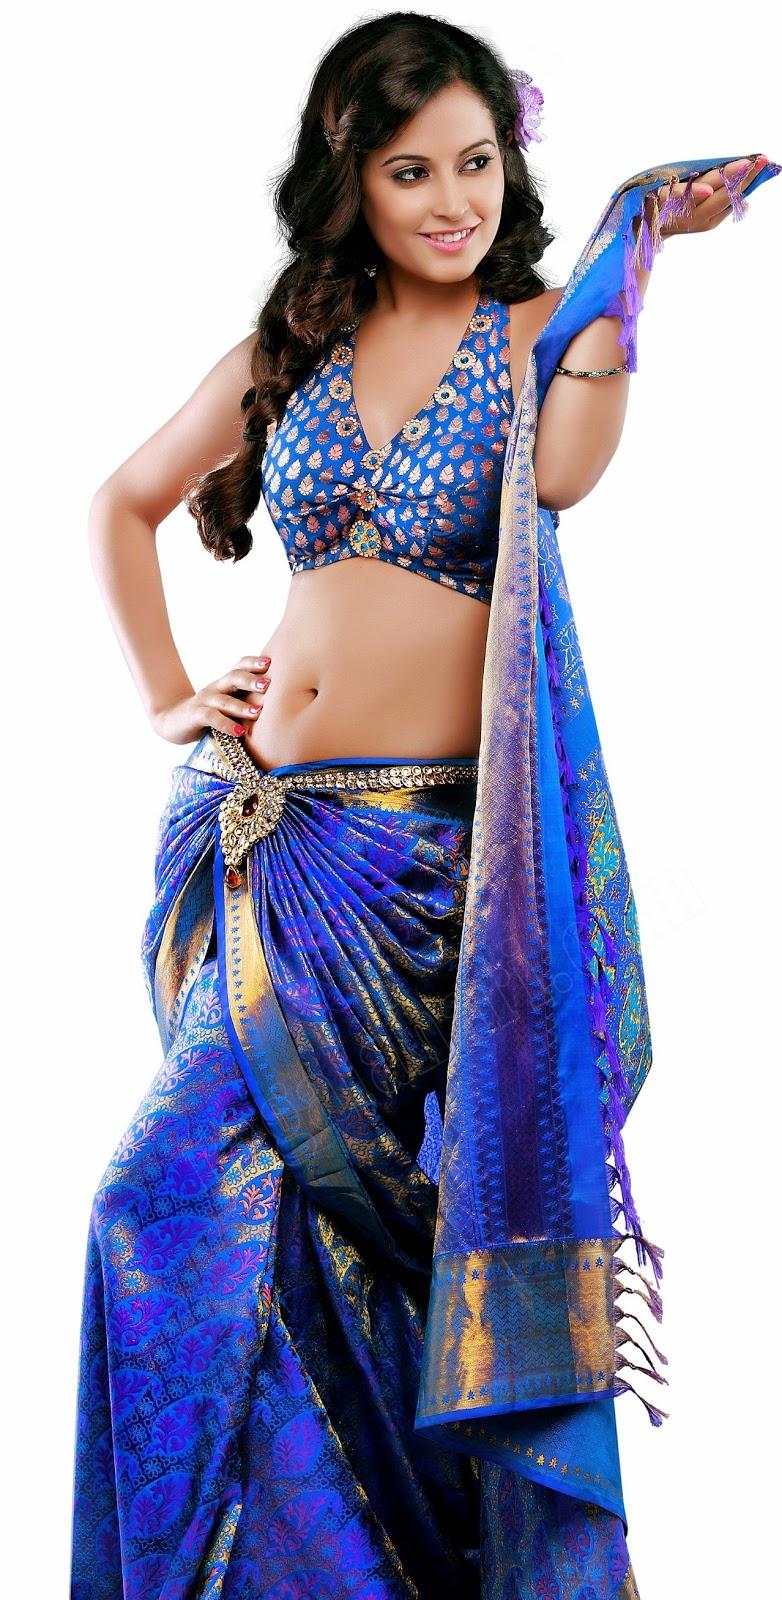 Desi Aunty Saree Mms